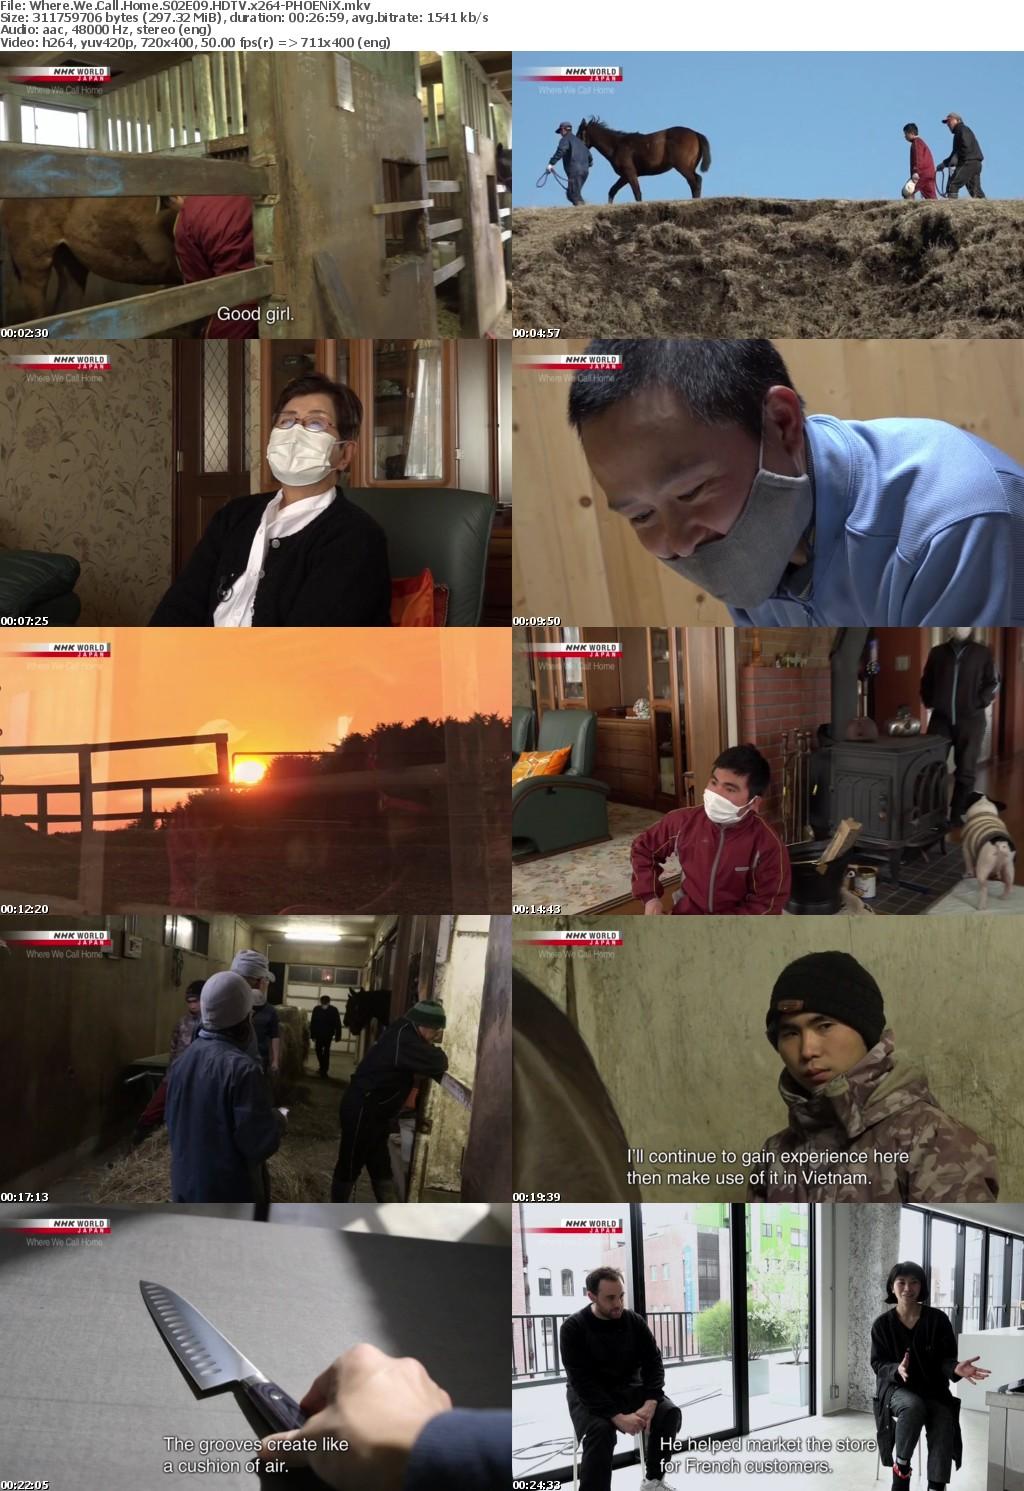 Where We Call Home S02E09 HDTV x264-PHOENiX